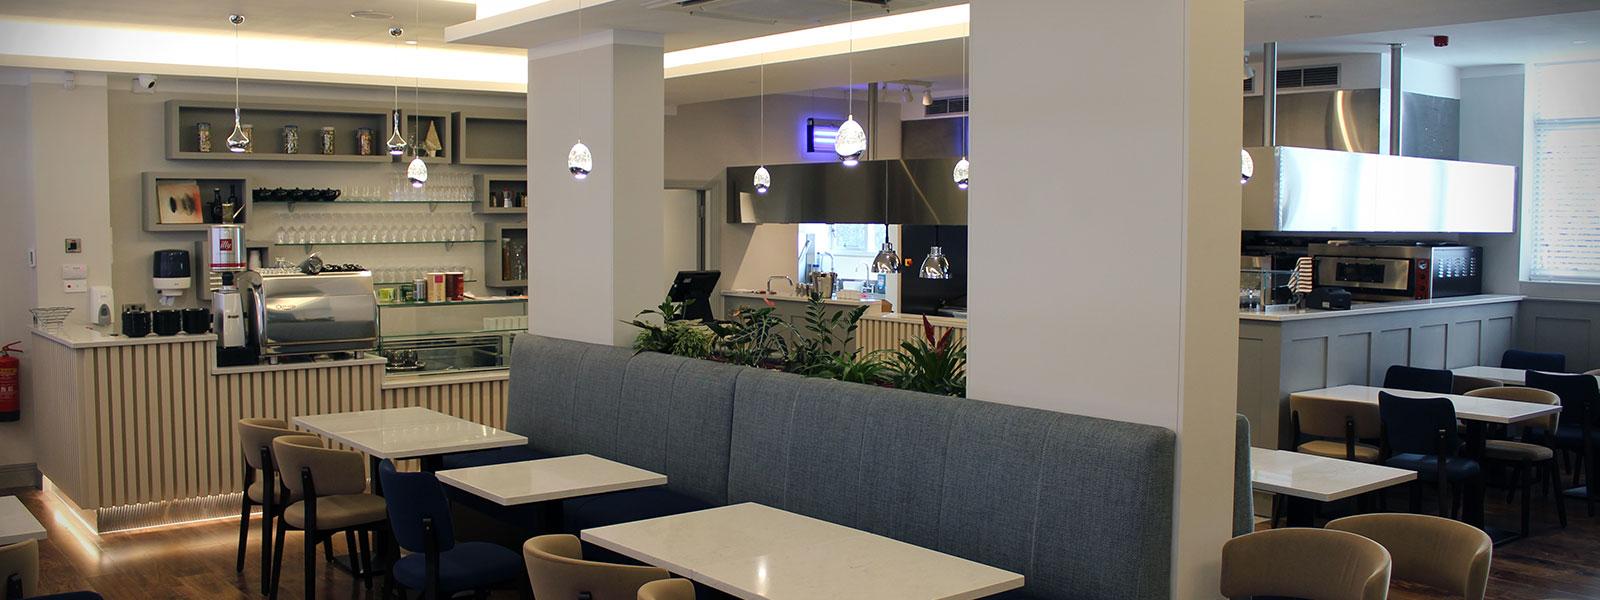 galileo-cafe-featured